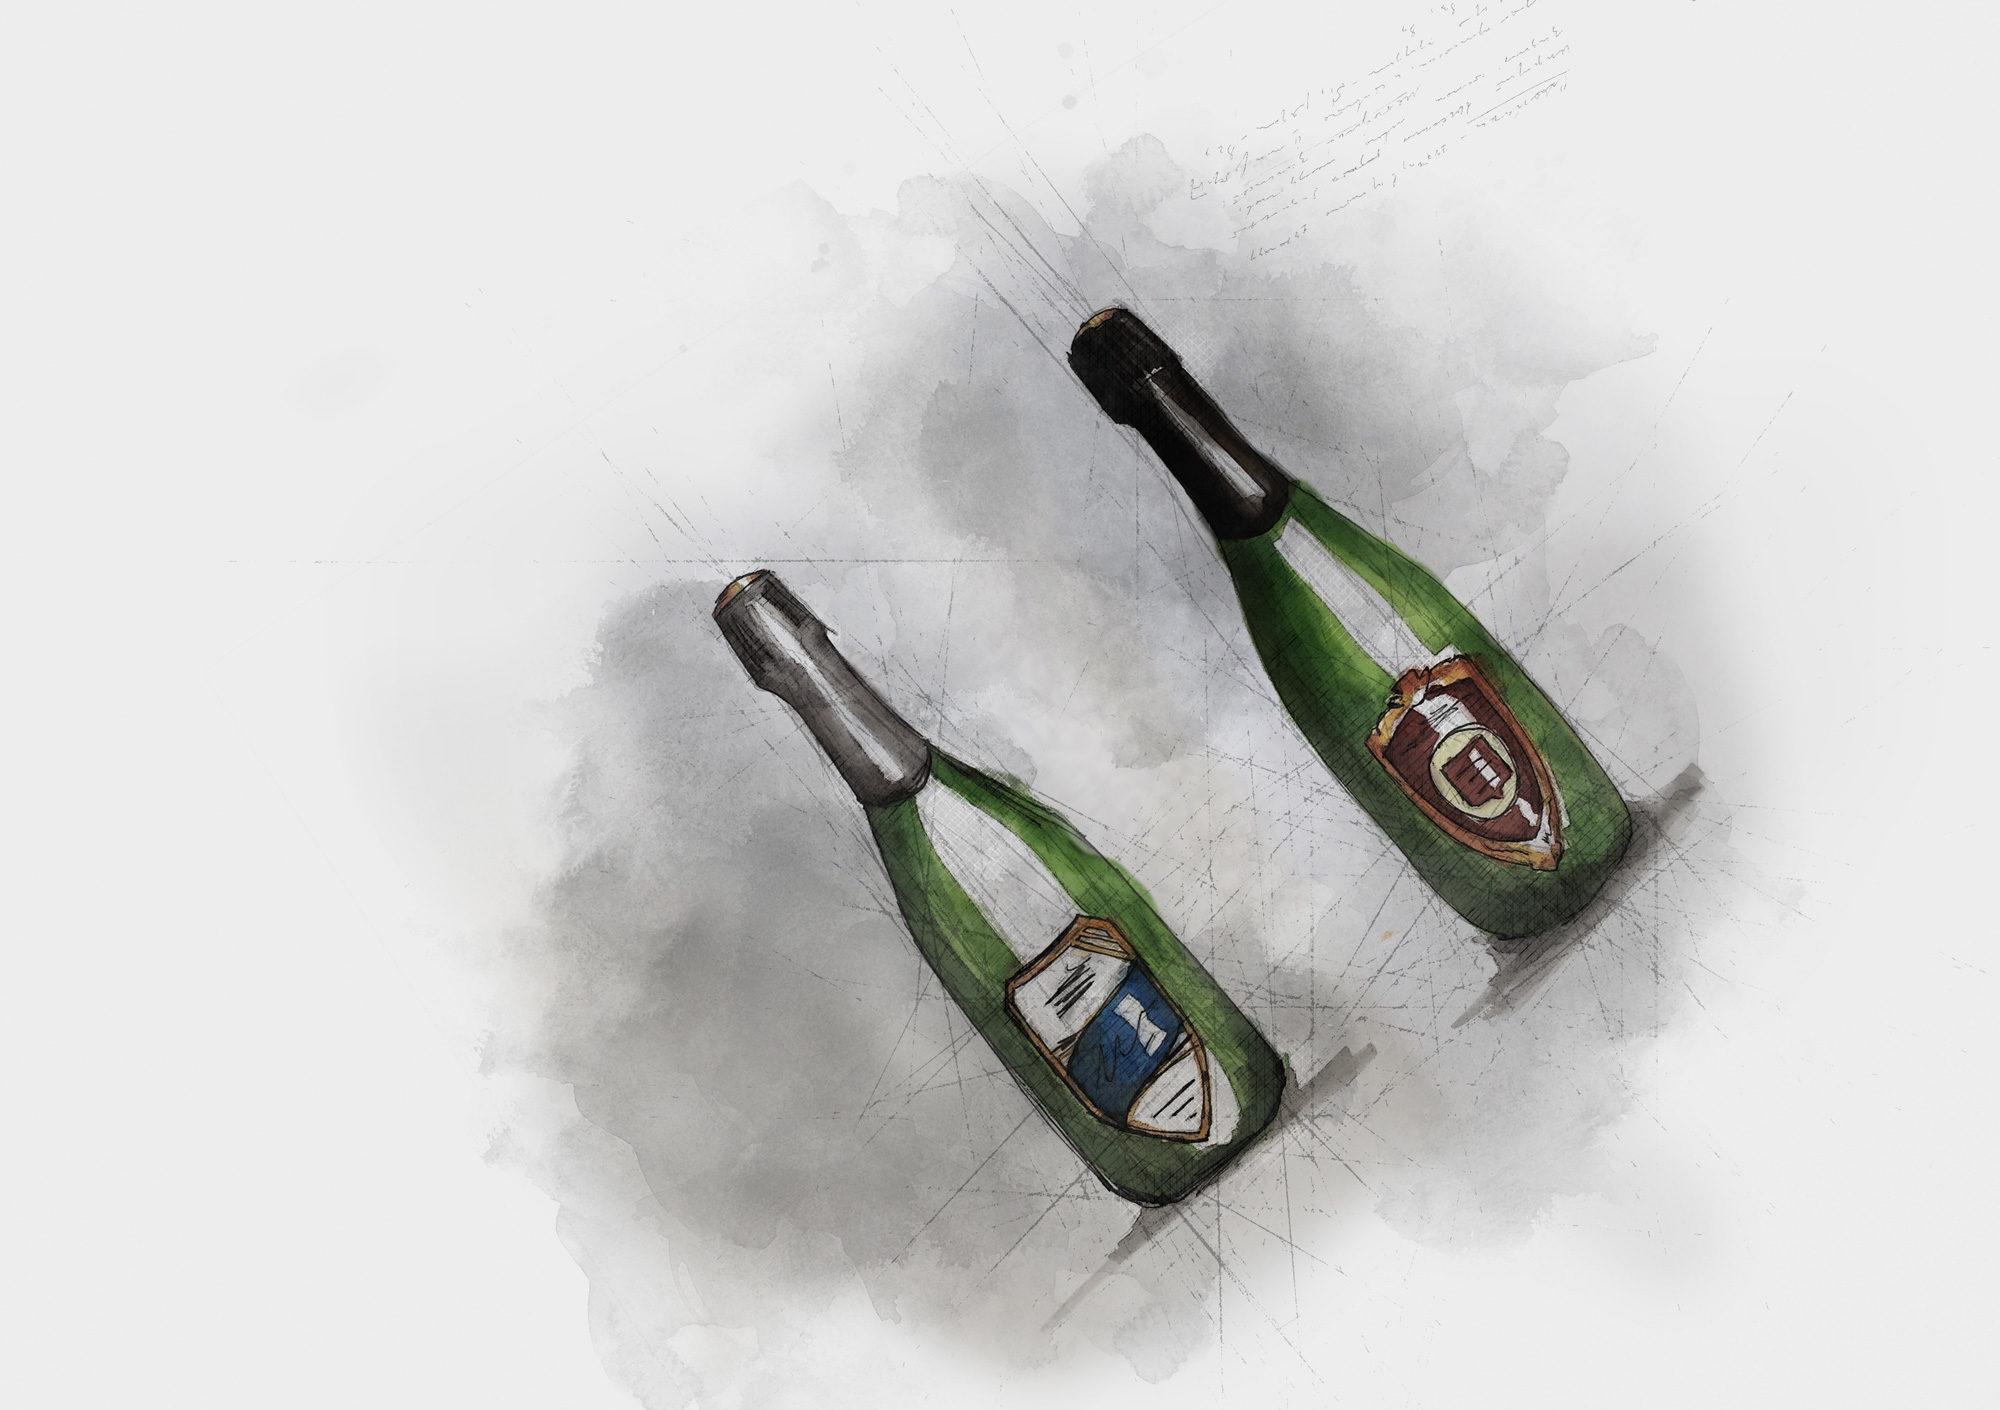 From The Archive — Development Work.@lymebaywinery.#englishsparklingwine #drawing #packaging #packagingdesign #labeldesign #branding #graphicdesign #label #foil #deboss #wine #winetasting #wines #englishwine #vintage #vinyards #winenot #winelife #england #British #markers #pens #art #sparklingwine